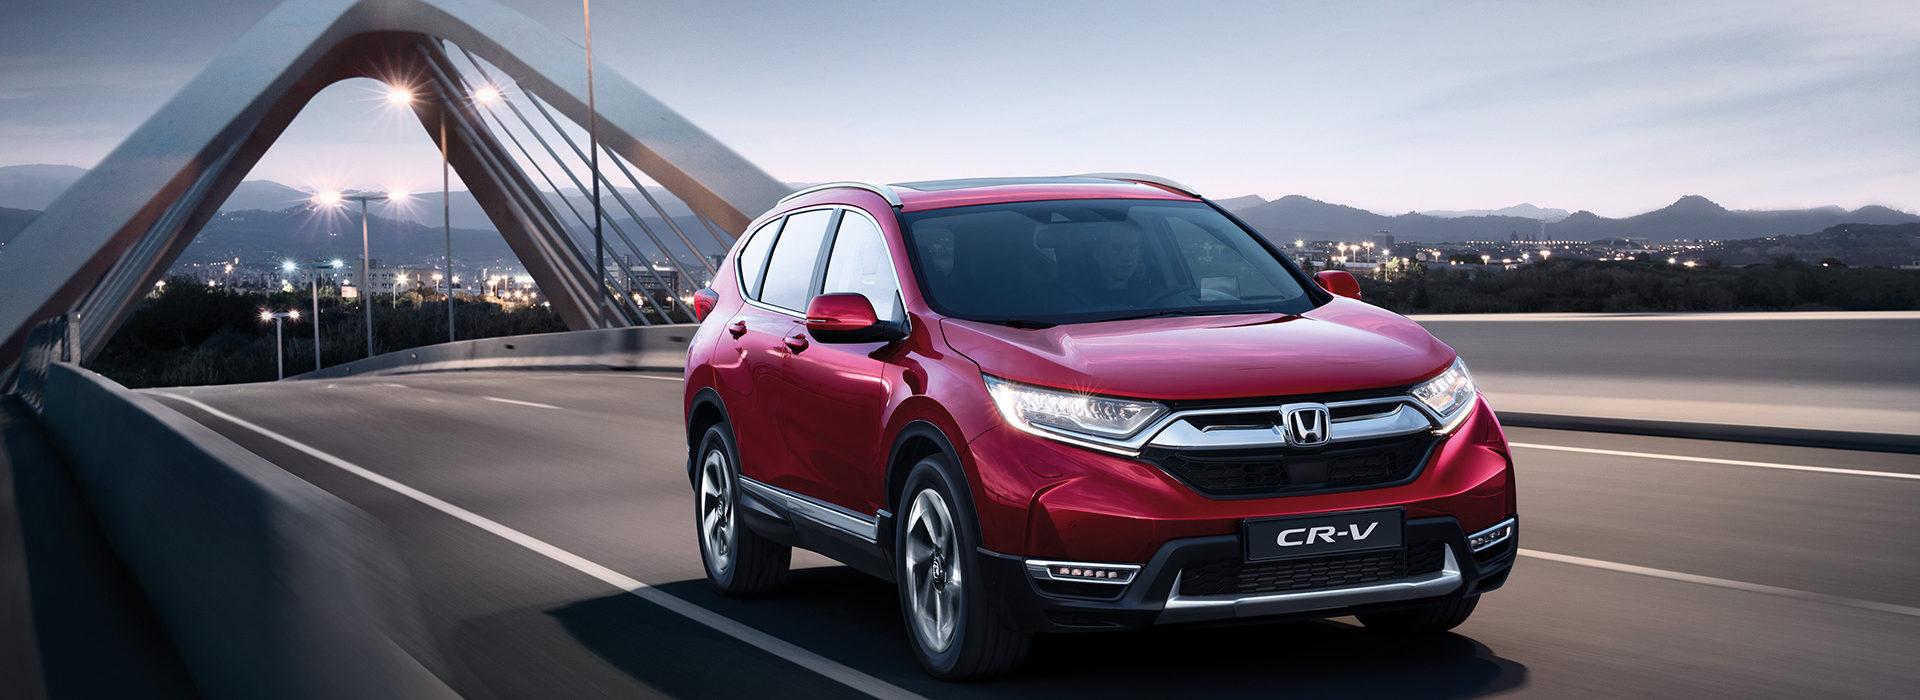 HONDA CR-V Executive Sports utility vehicle 2.0 I-MMD HYBRID E-CVT 4×4 Benzina : Honda CR-V Executive